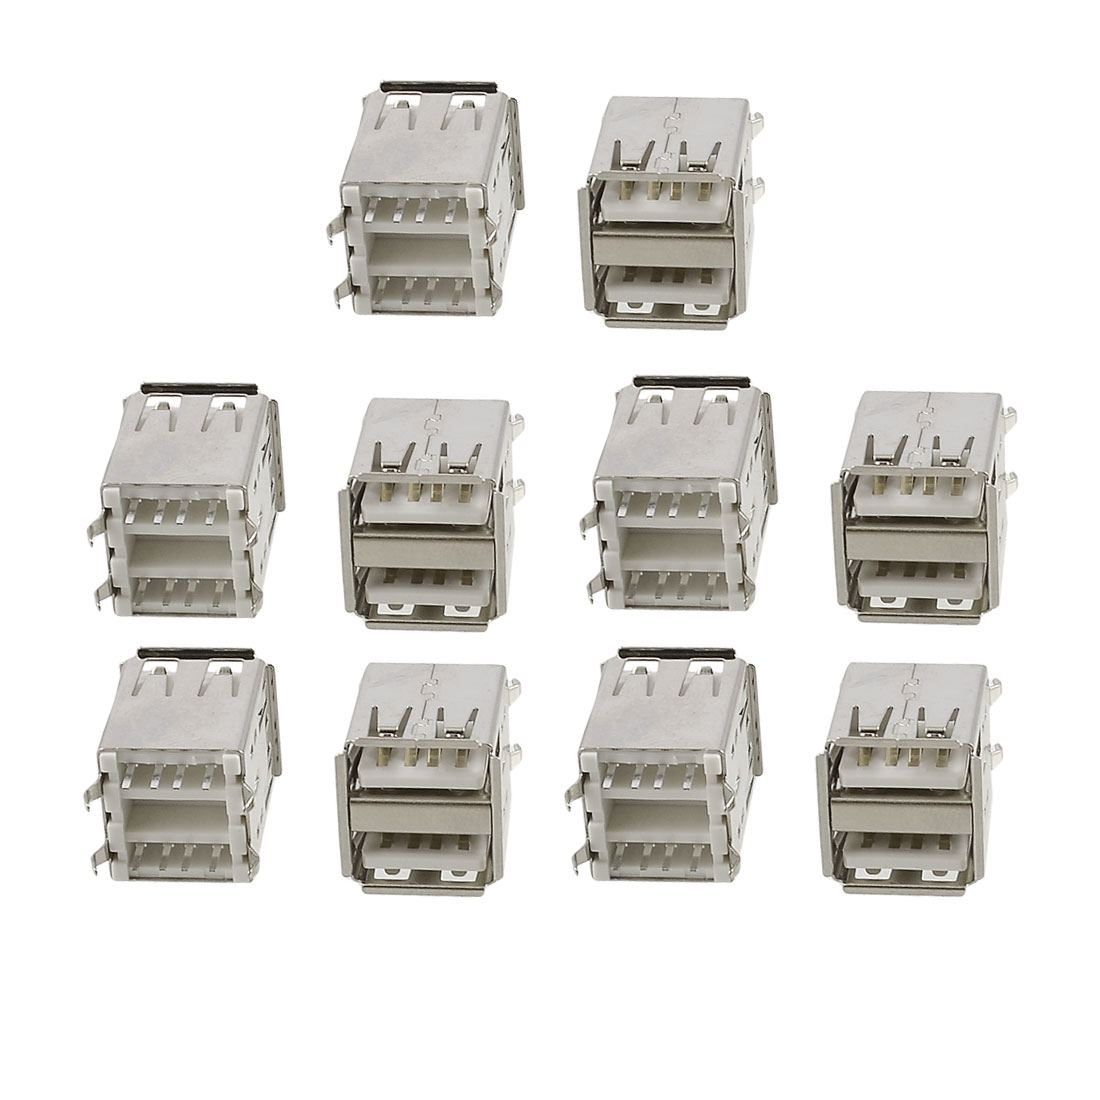 10 x Double Layer USB A Female Jack Solder Connectors